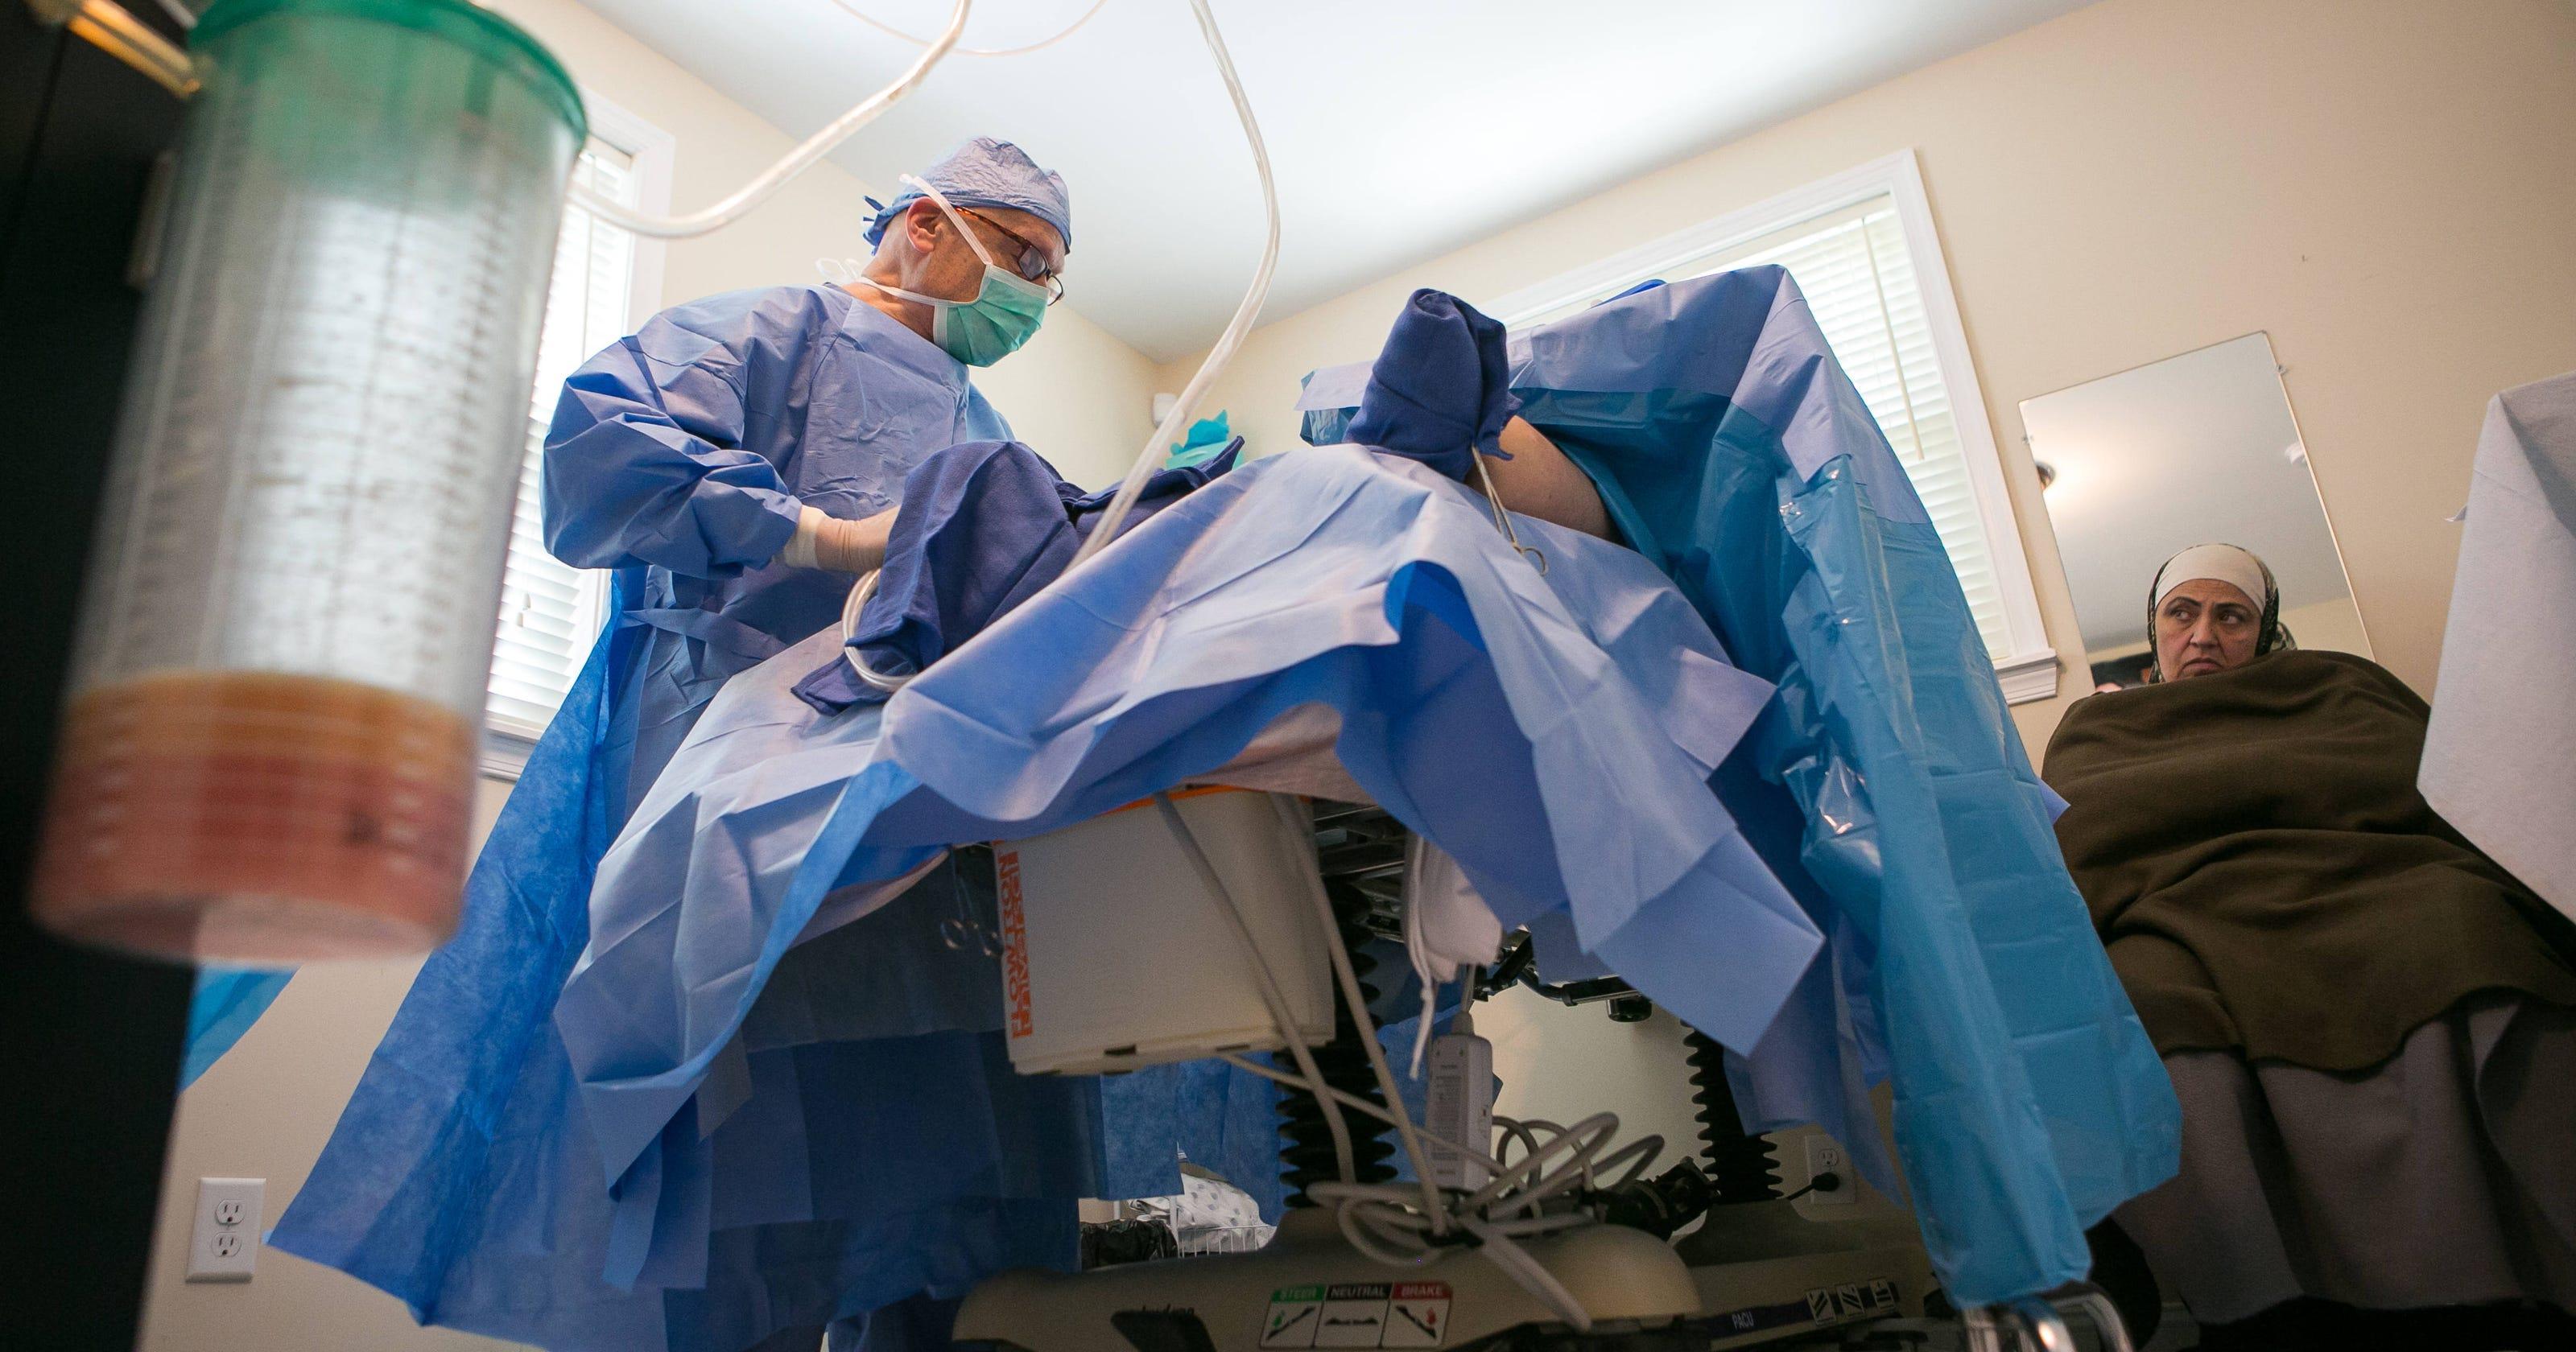 Liposuction: Treatment of choice for painful lipedema